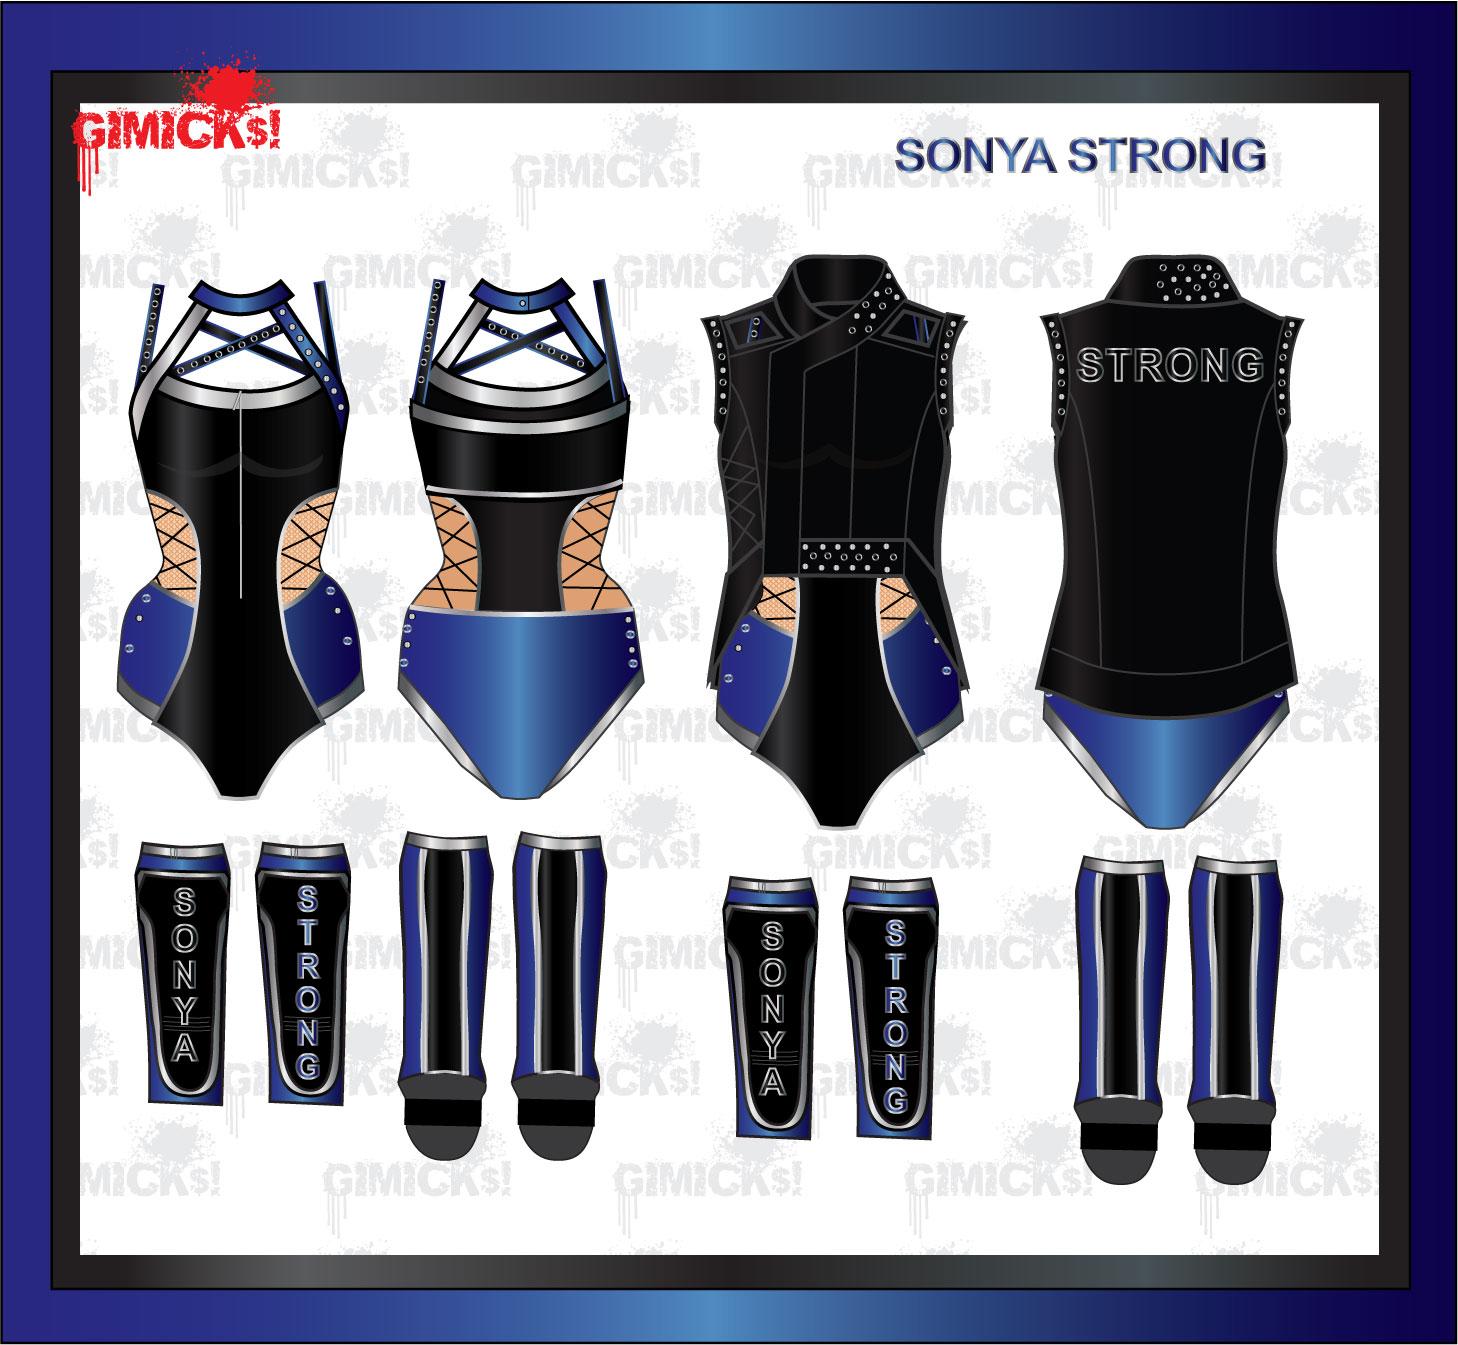 Sonya-Strong-Final-Design-blue.jpg